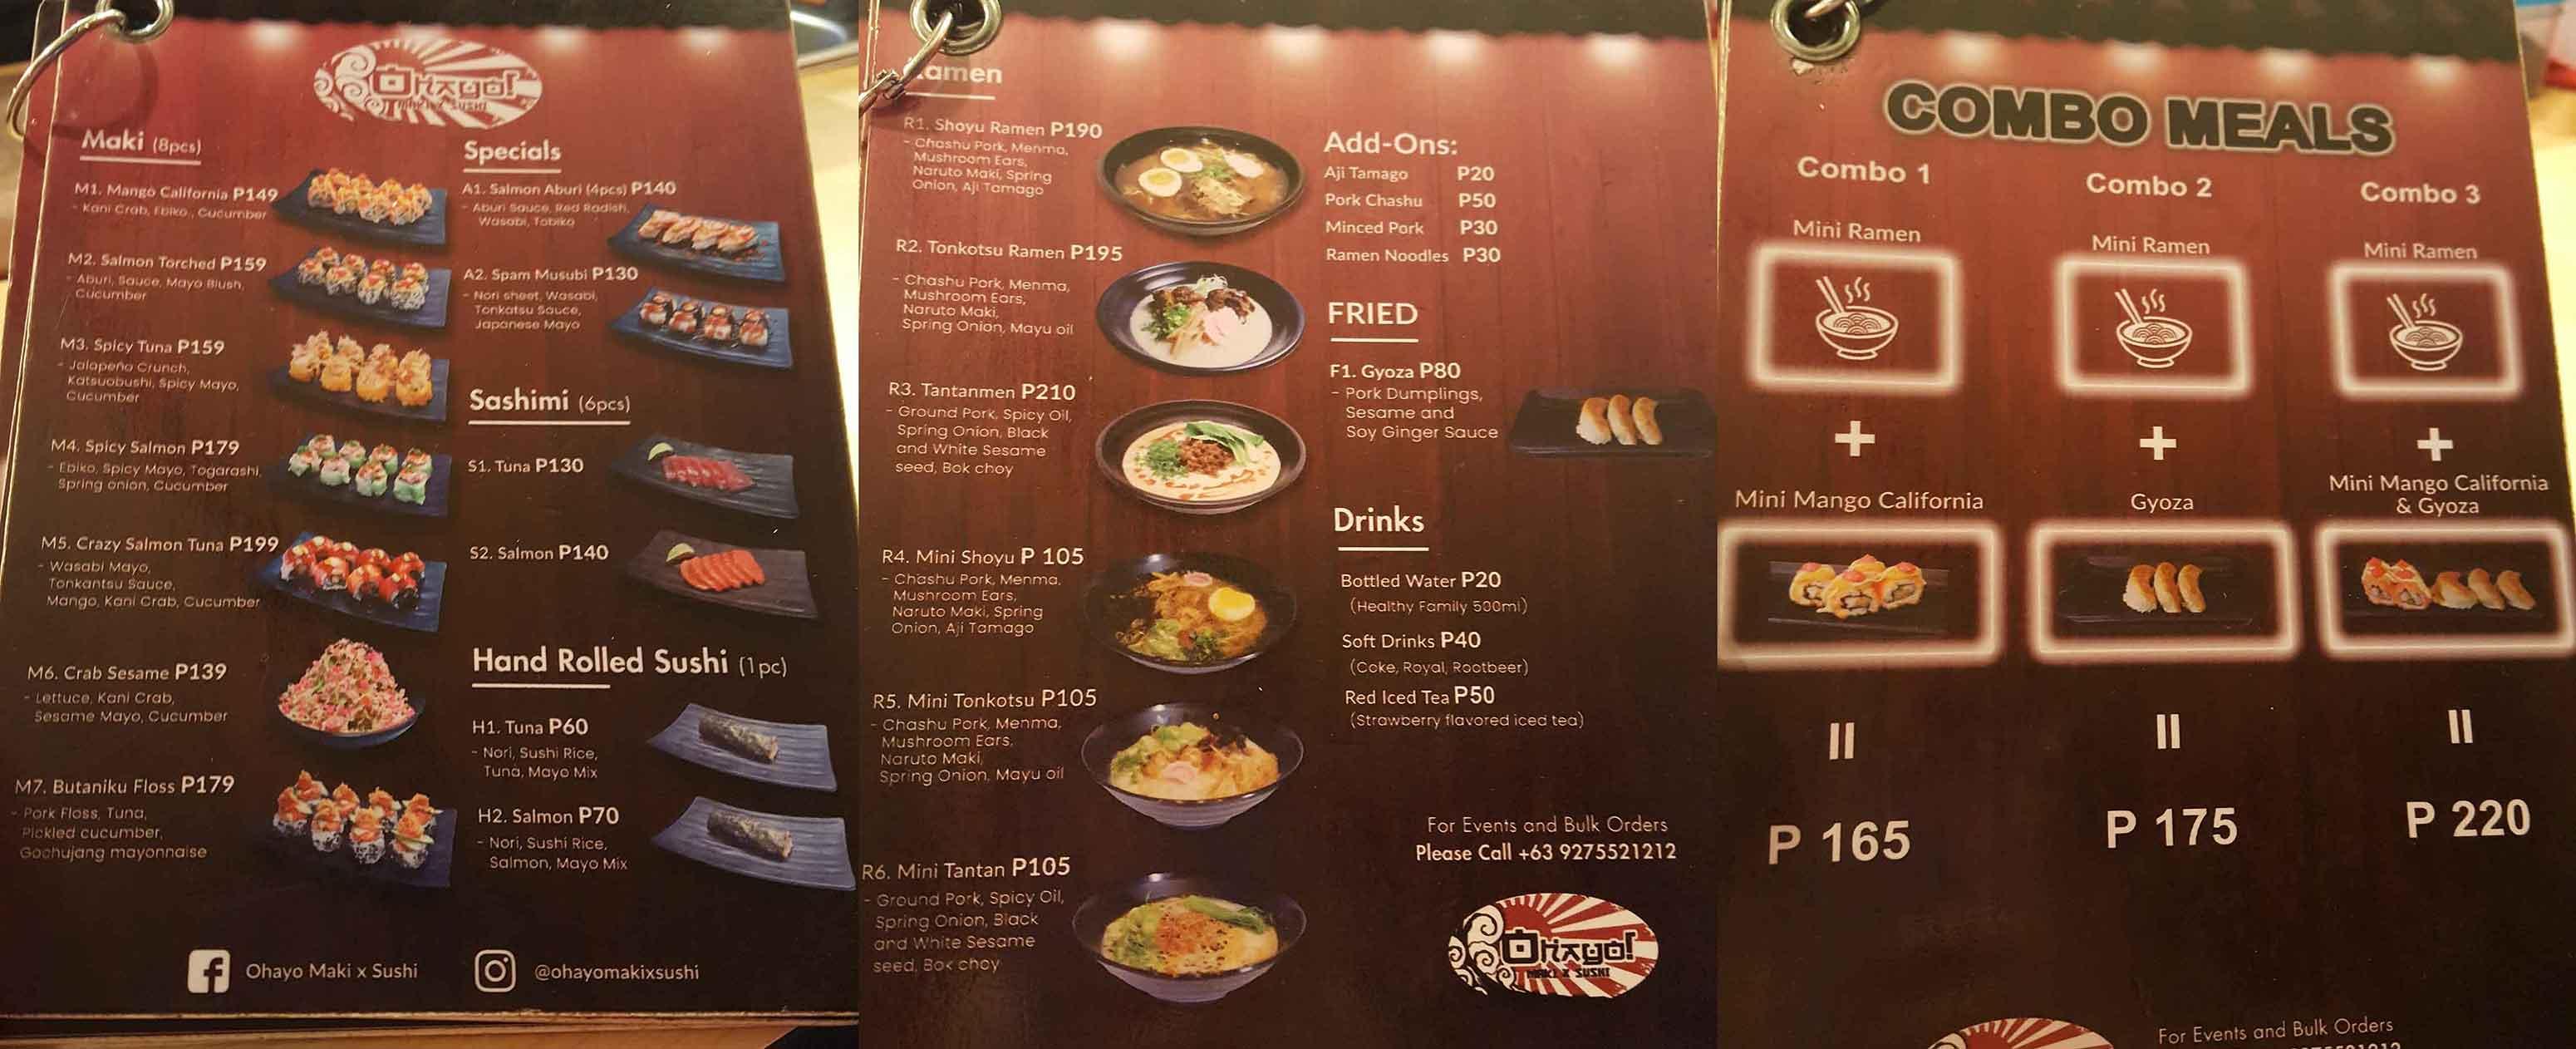 Timog ave Ohayo menu